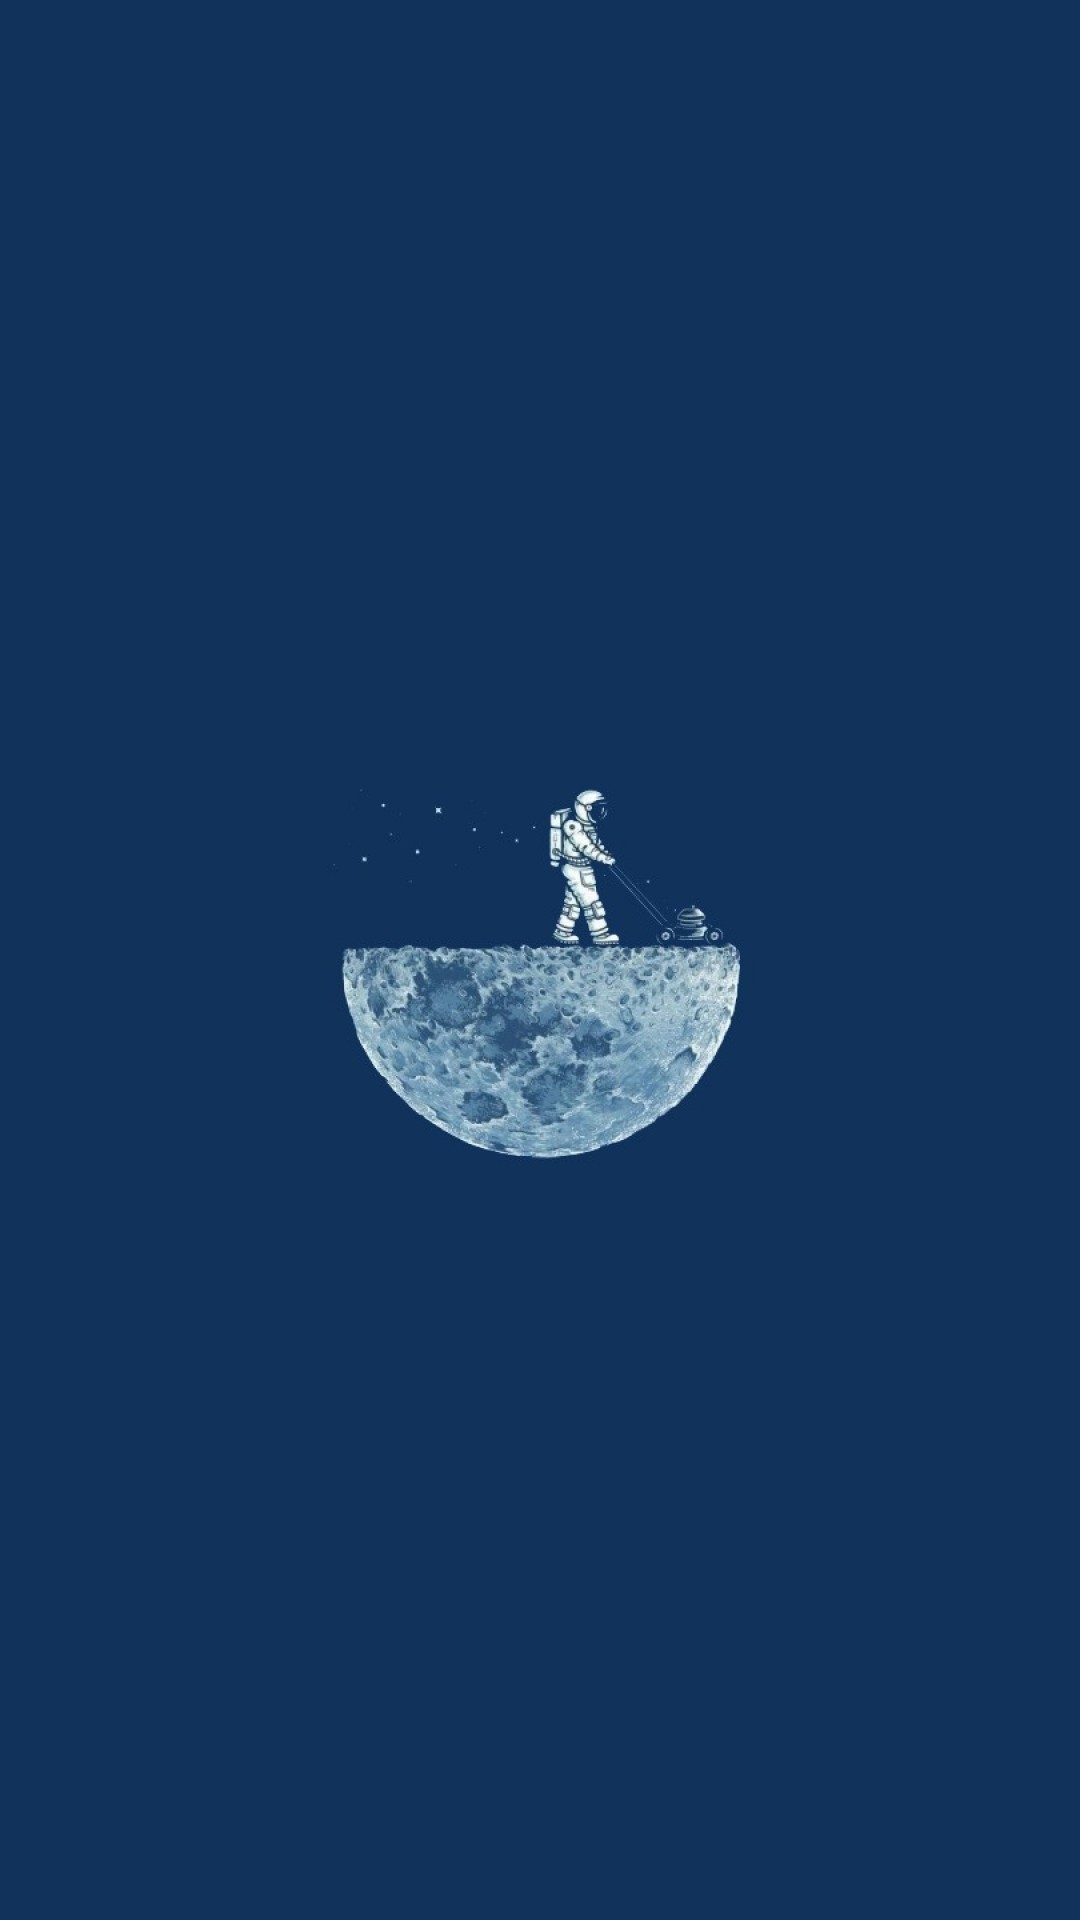 wallpaper moon mow  4k  hd  moon  minimalism  iphone